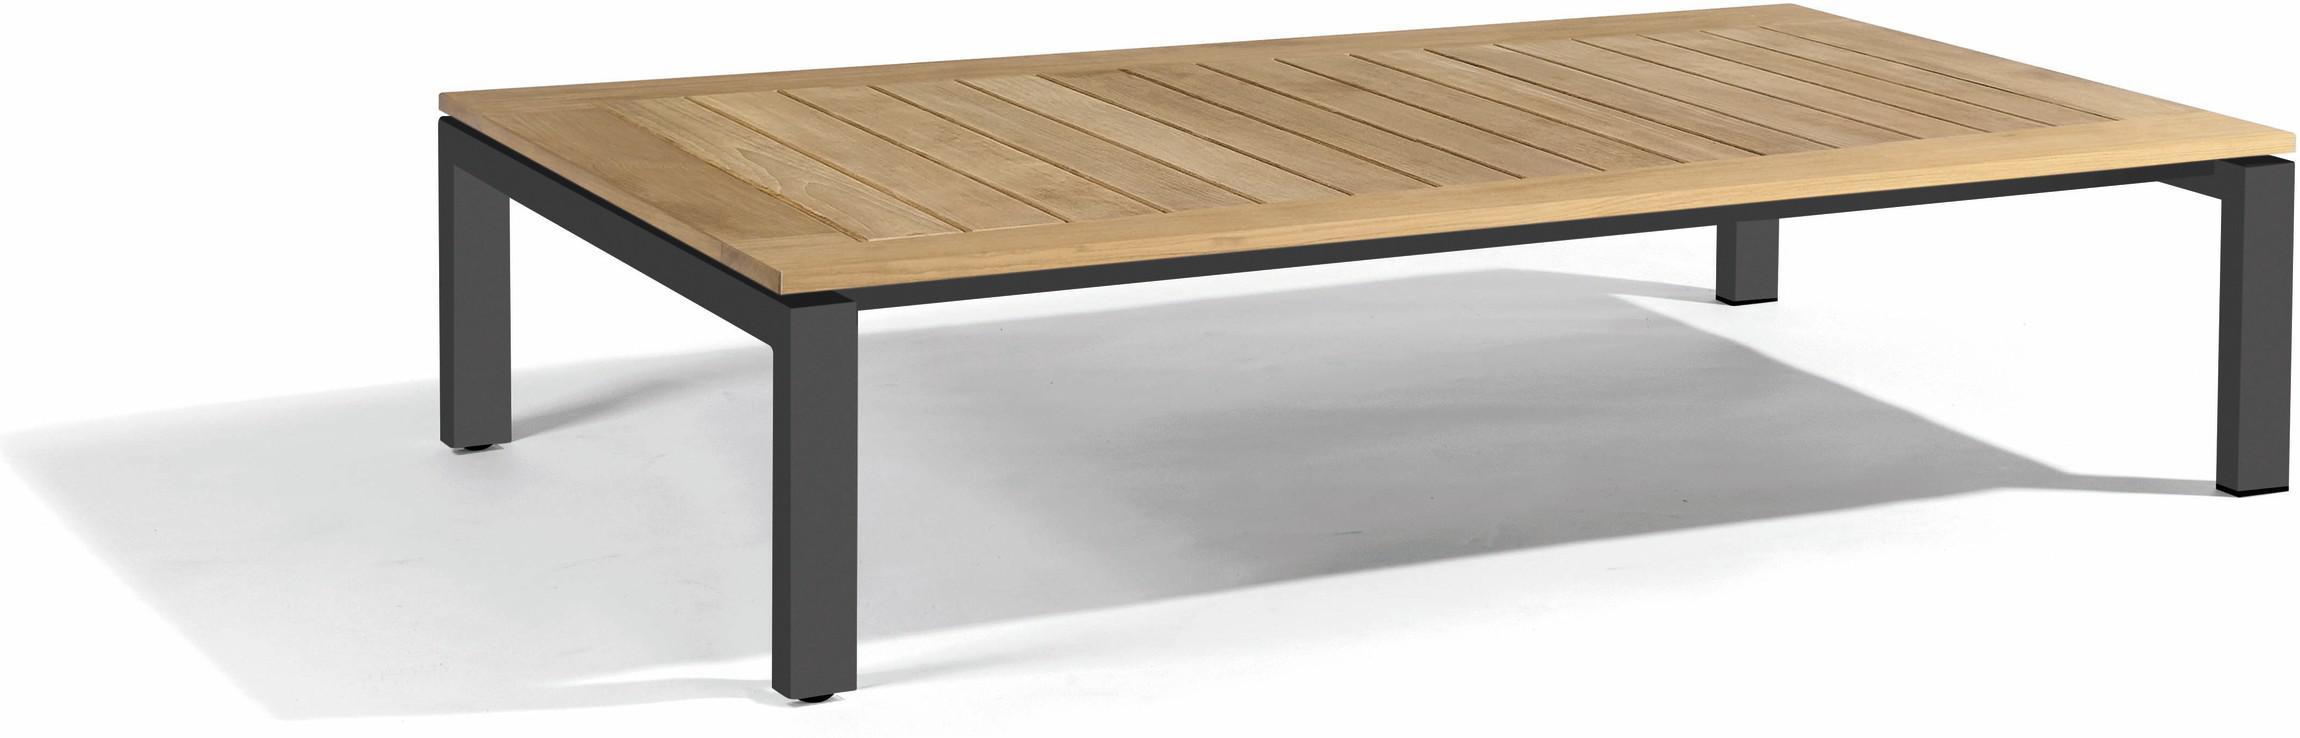 Trento Coffee table - teak slates in frame 150